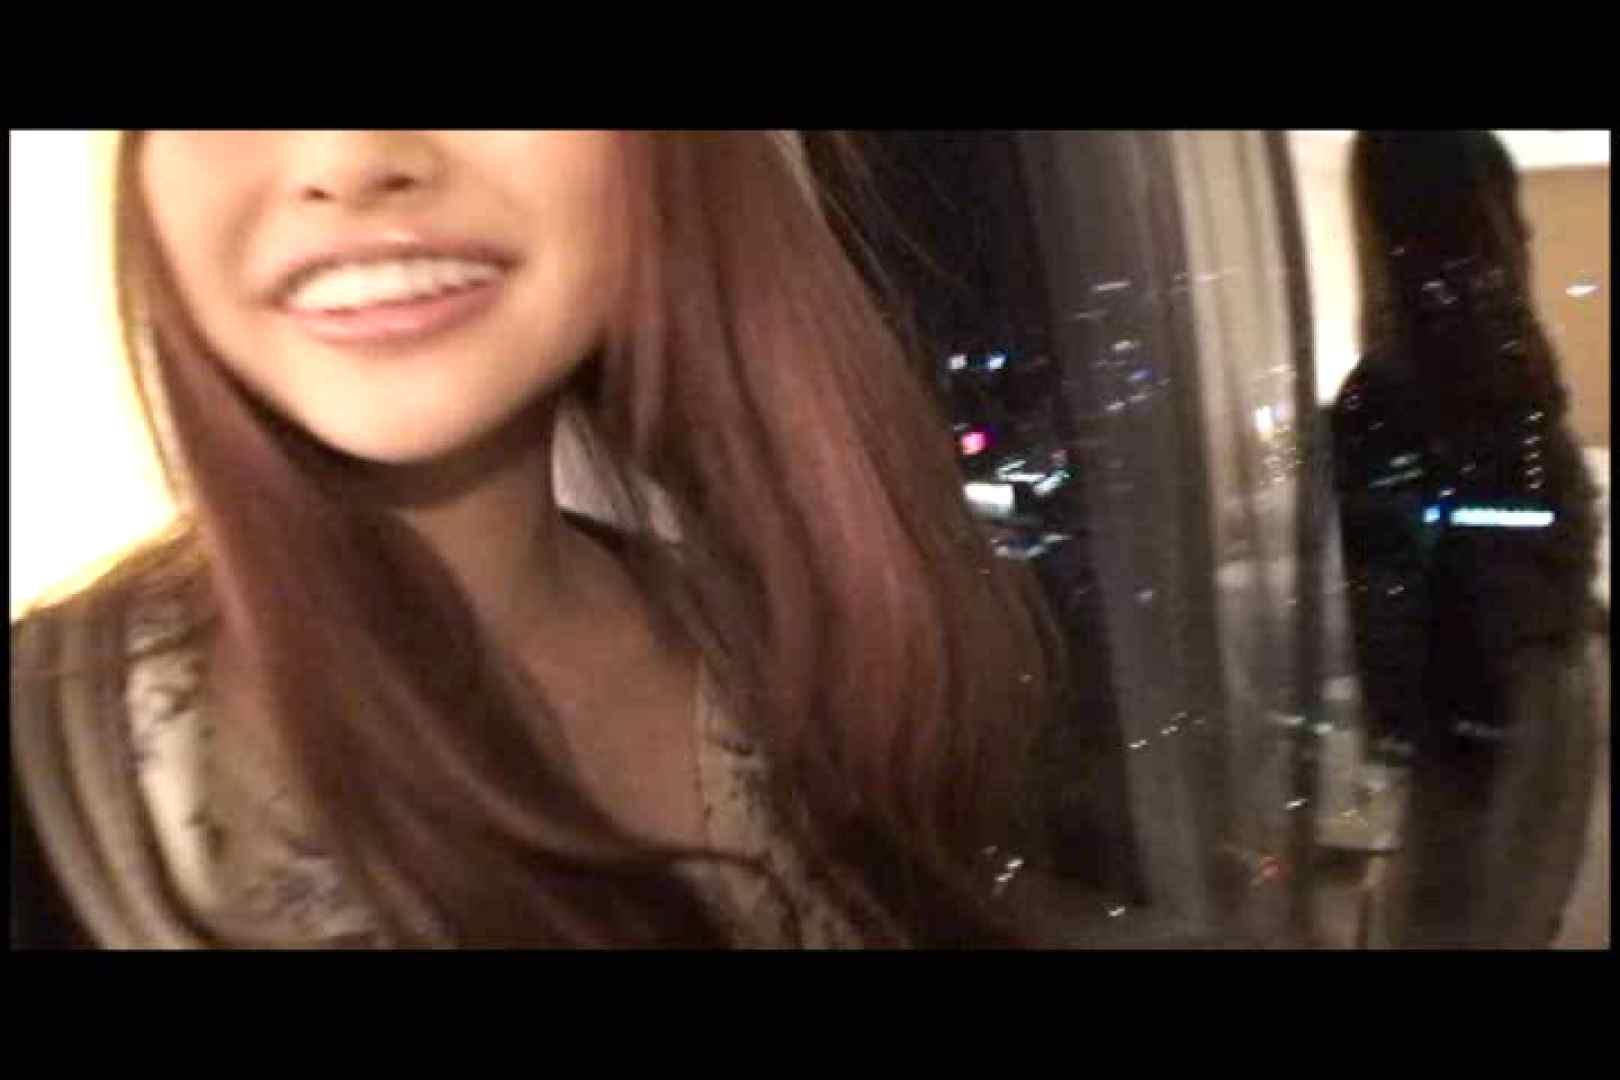 JDハンター全国ツアー vol.058 後編 女子大生のエロ動画 | 0  106PIX 43